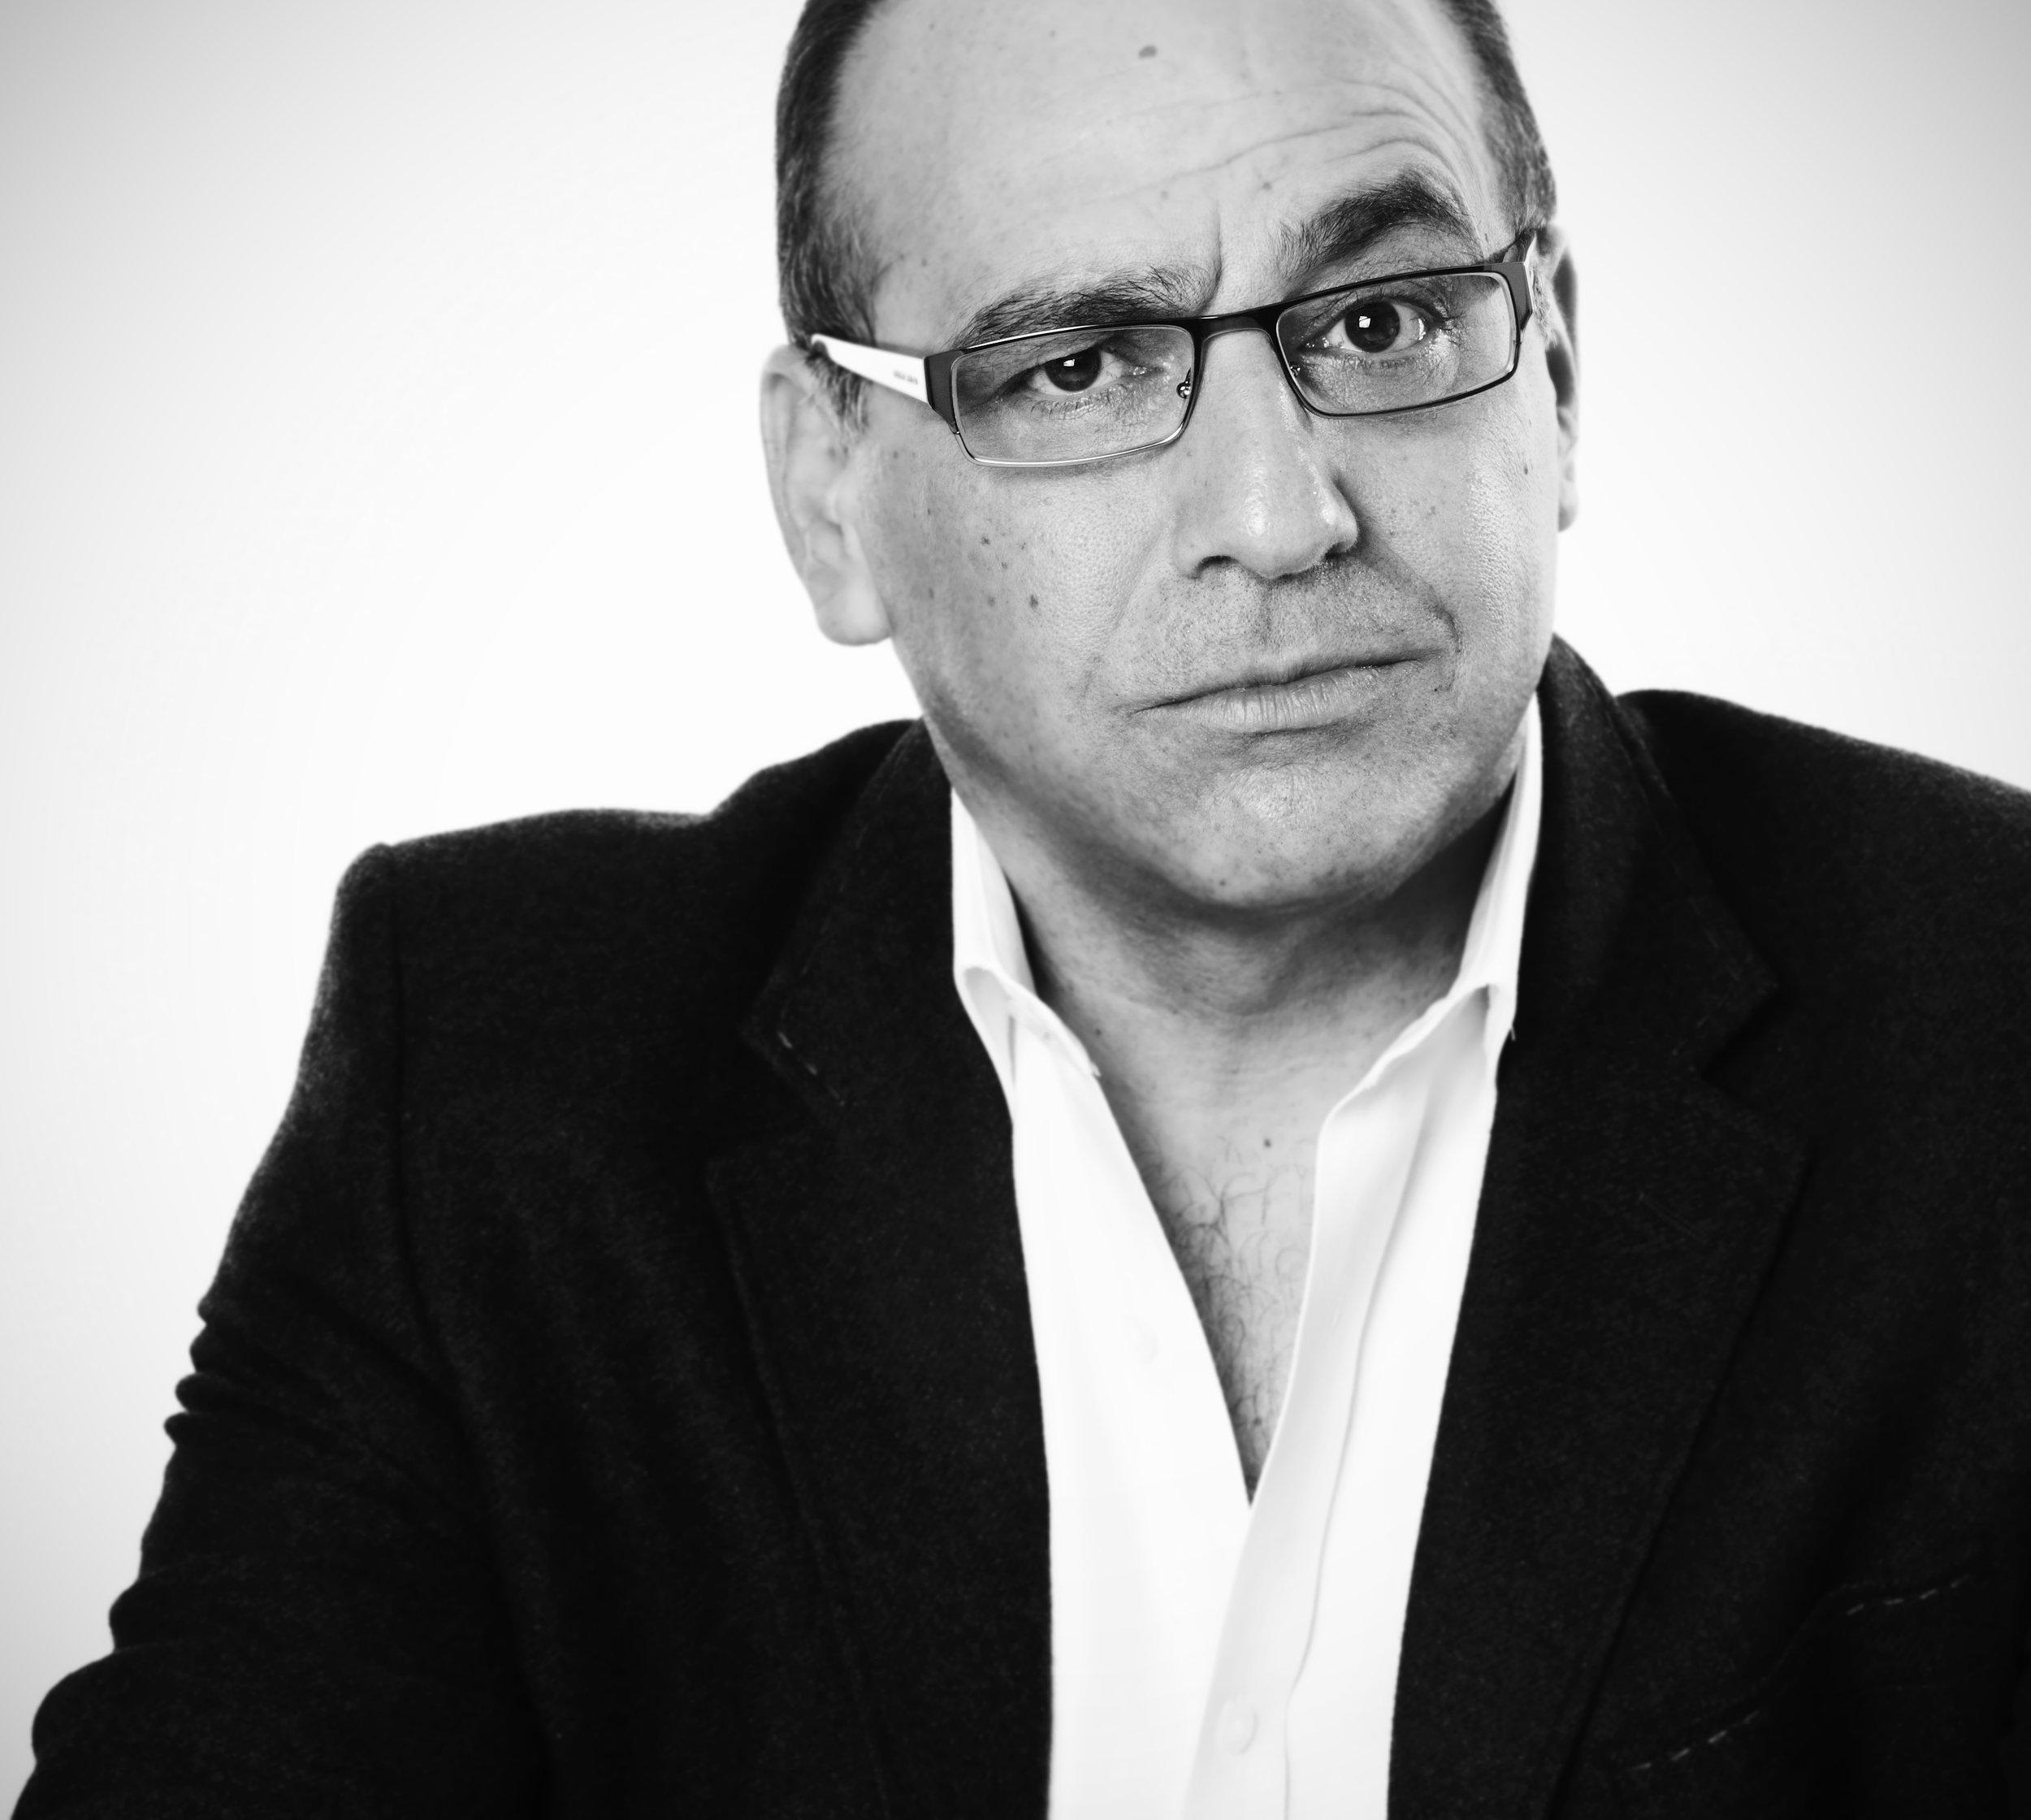 Theo Paphitis, Entreprenuer